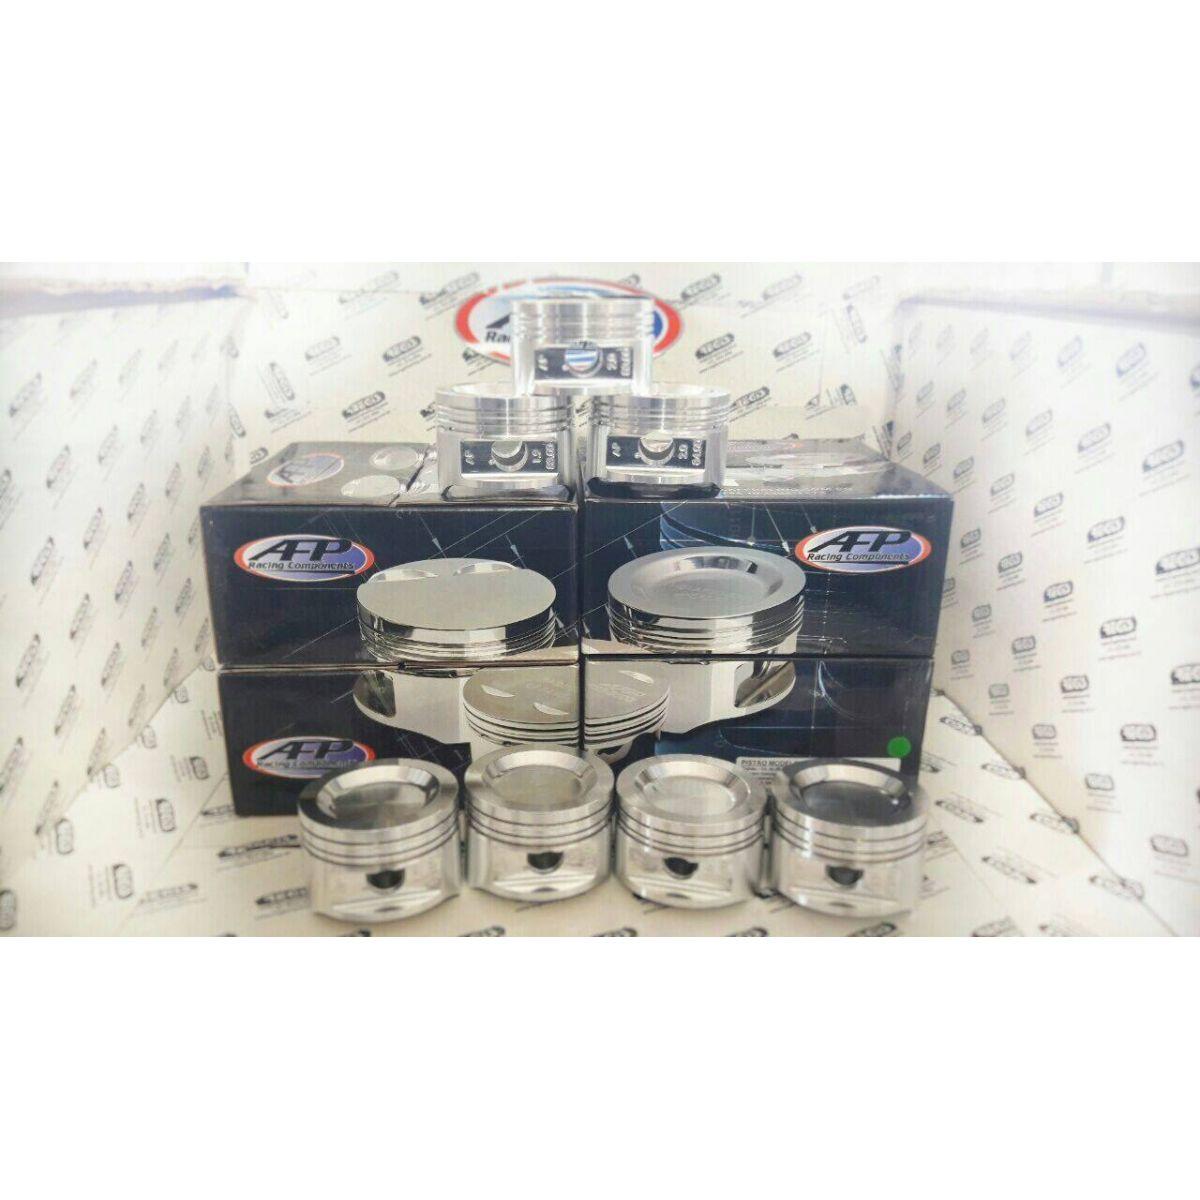 Pistao AFP Liquid Forged VW AP 1.9 83,50mm p/ 800cv